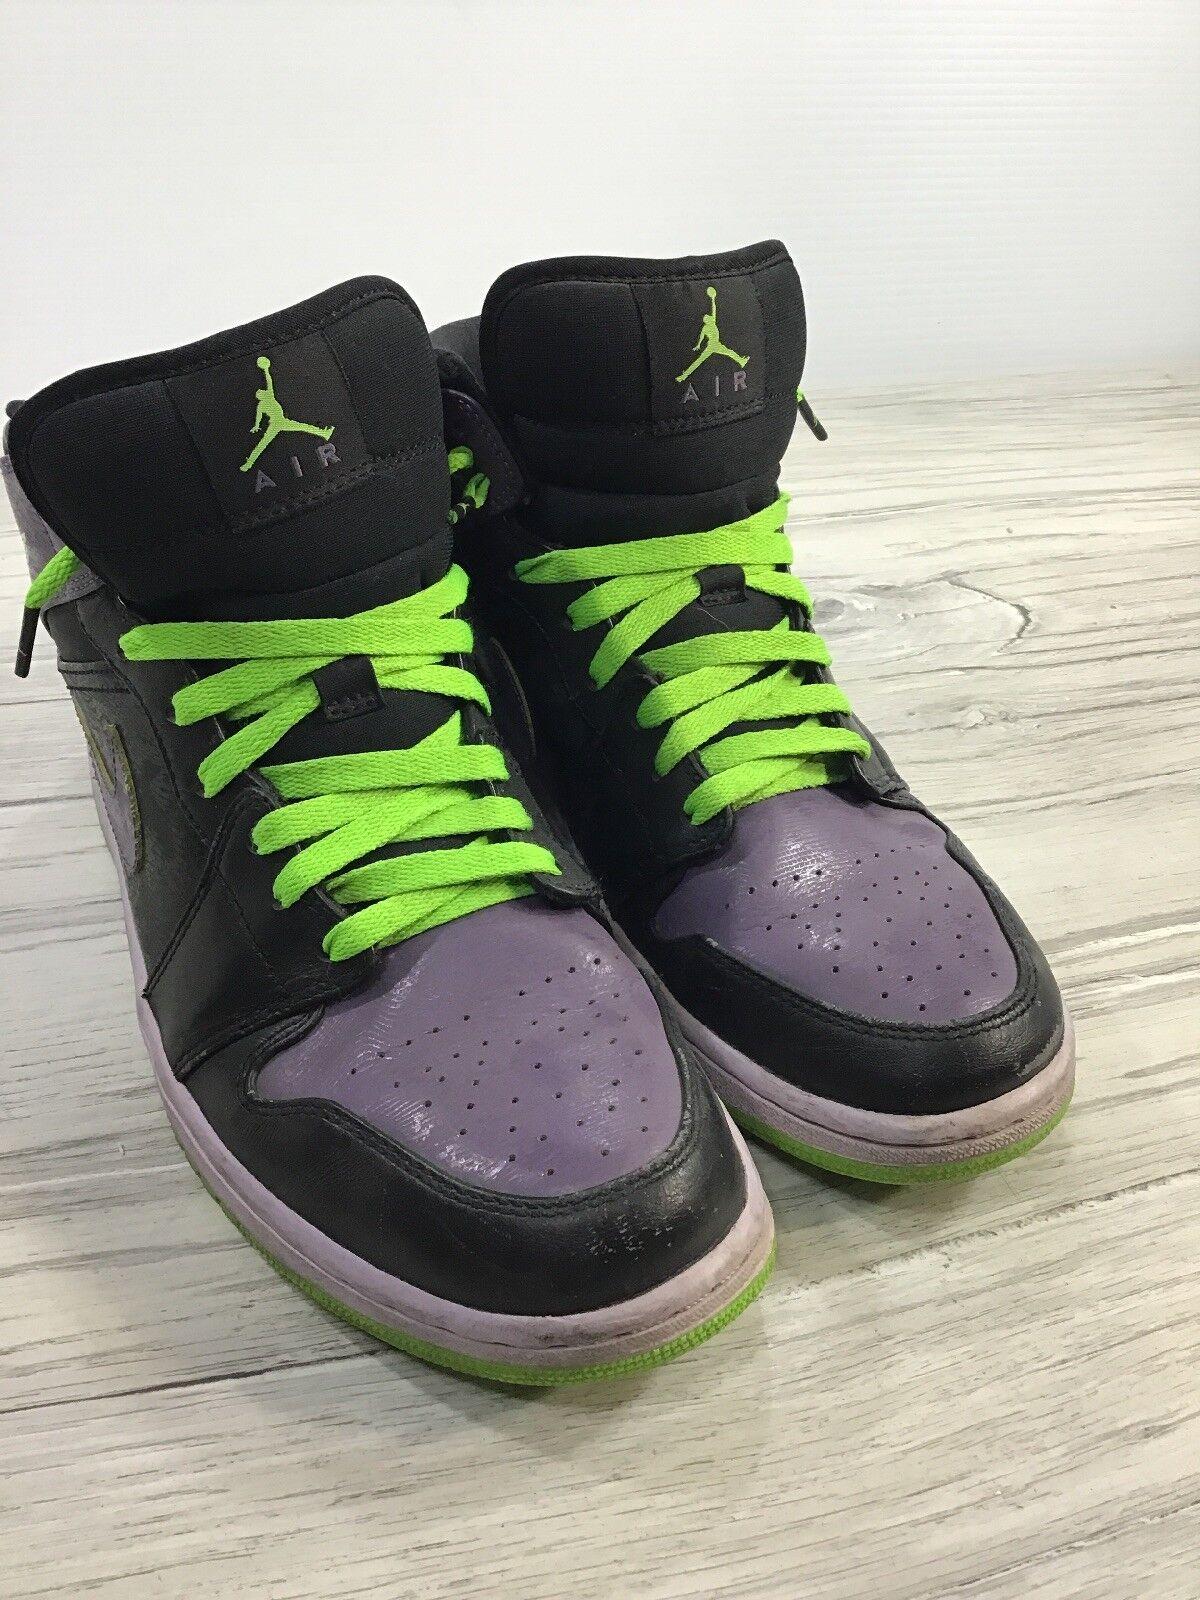 NIKE Air Jordan Retro Joker Stealth Electric Green High 10.5 Men's